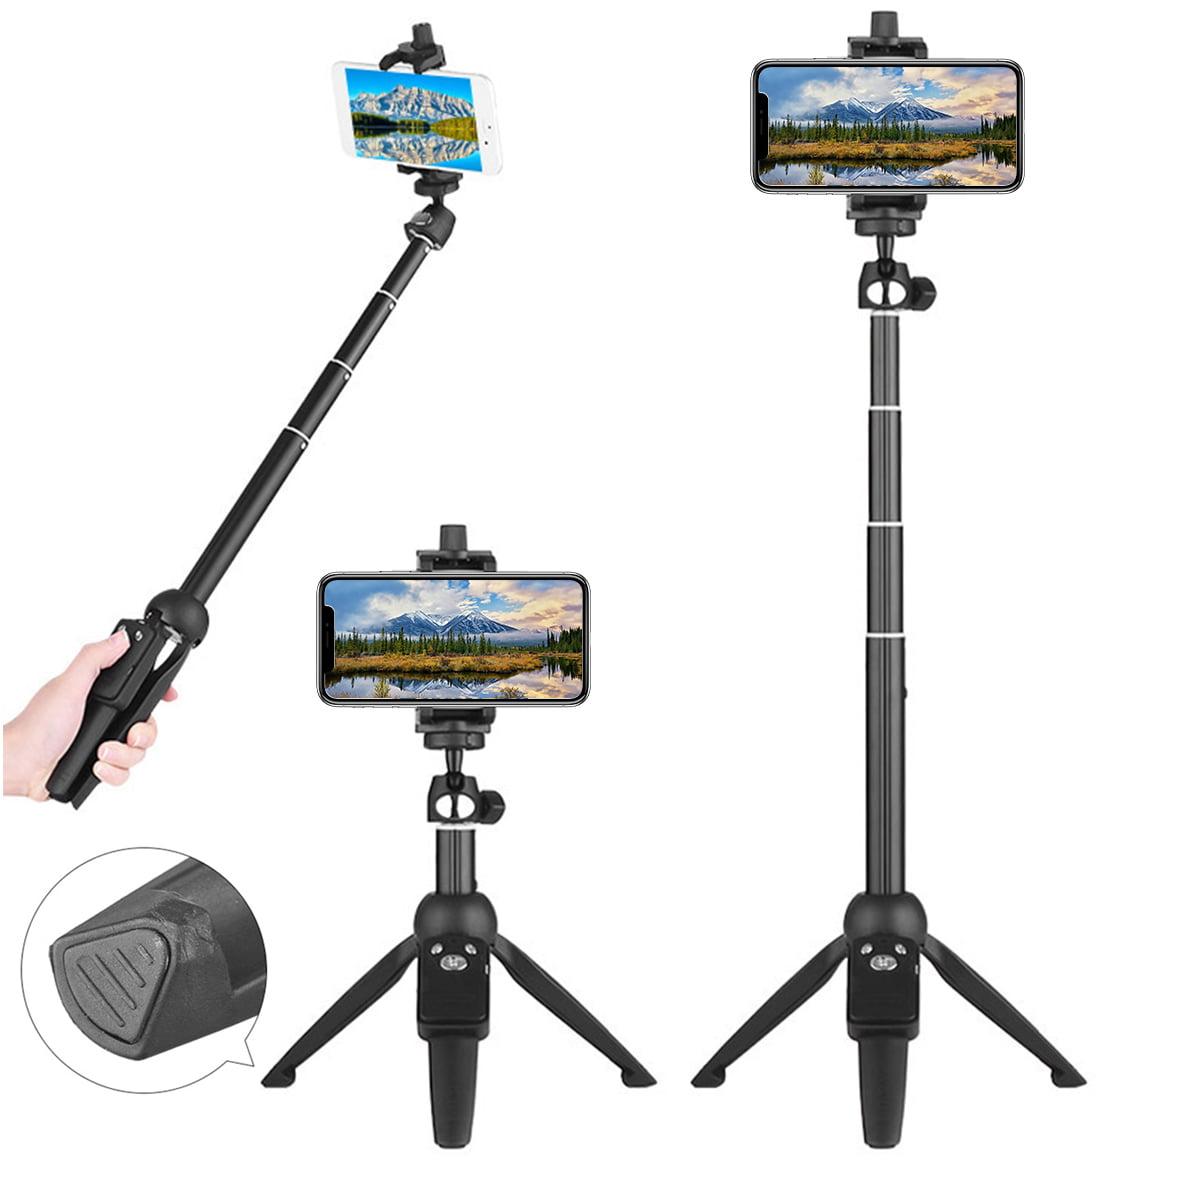 LSYOA Bluetooth Selfie Stick Tripod Stand Selfie Stick Monopod Wireless Remote Compatible with Smartphones Wireless Remote Extendable Stand,Pink